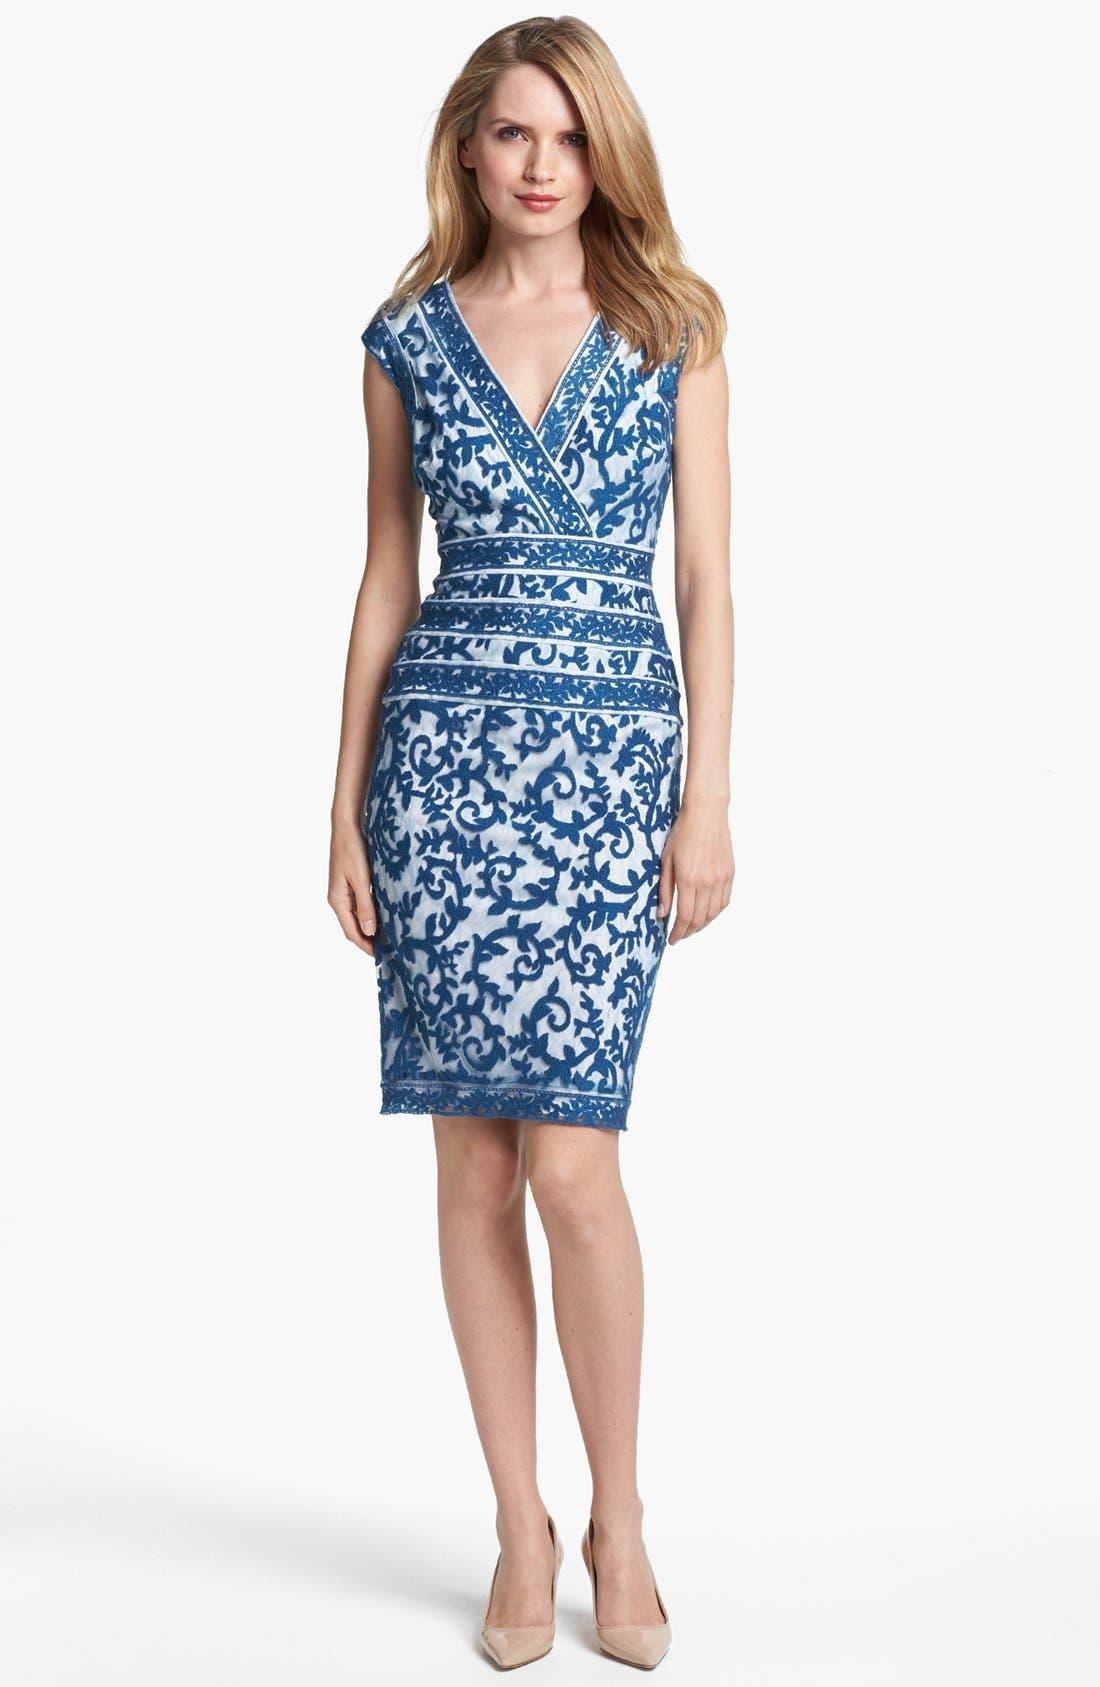 Alternate Image 1 Selected - Tadashi Shoji Embroidered Dress